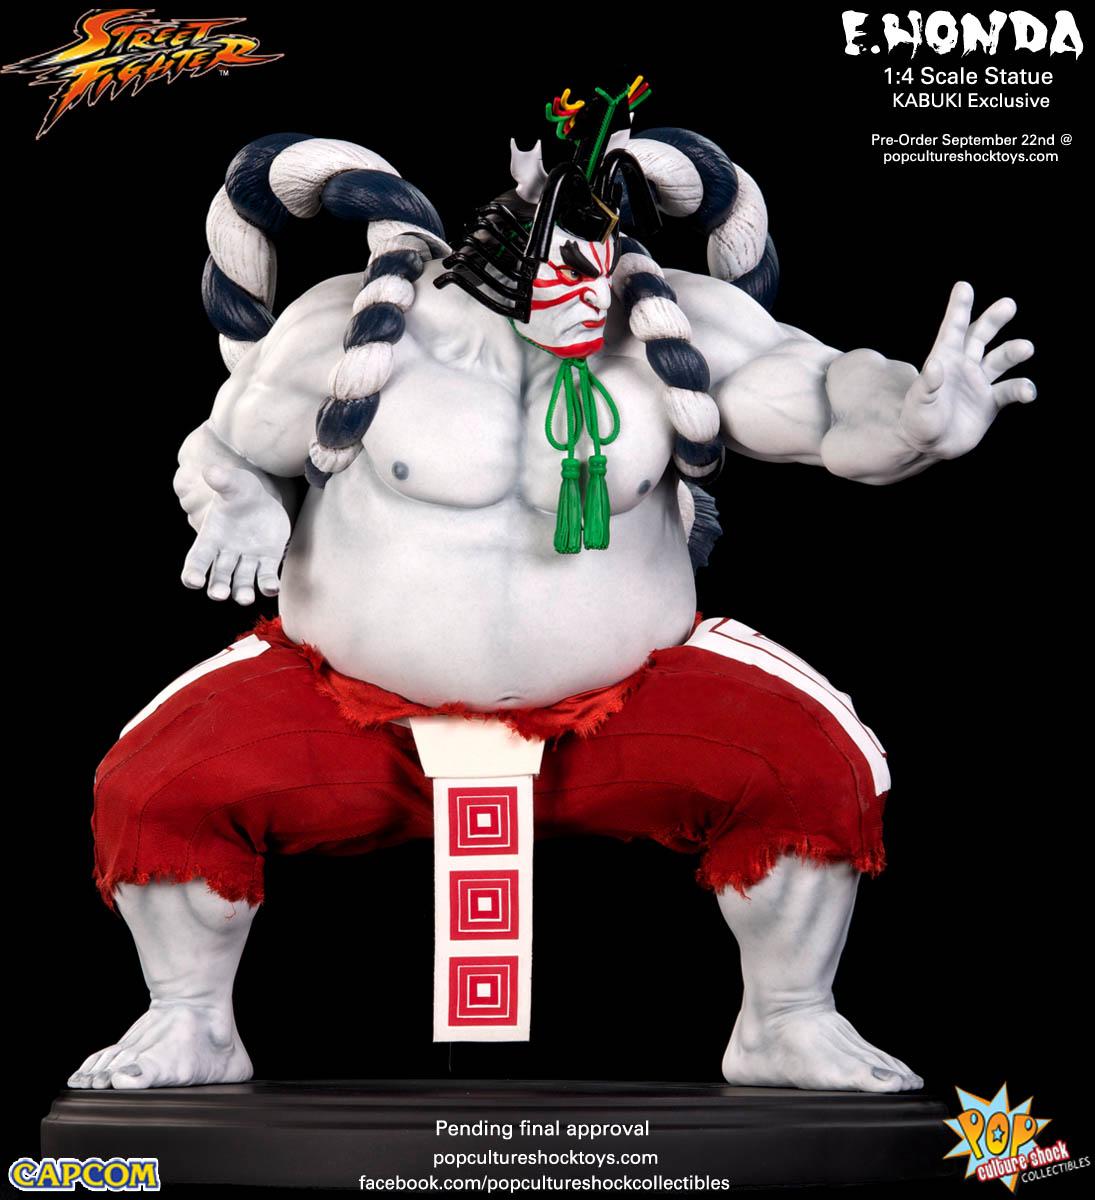 [Pop Culture Shock] Street Fighter: E. Honda 1/4 Statue - Página 3 Street-Fighter-E.-Honda-Kabuki-Statue-004